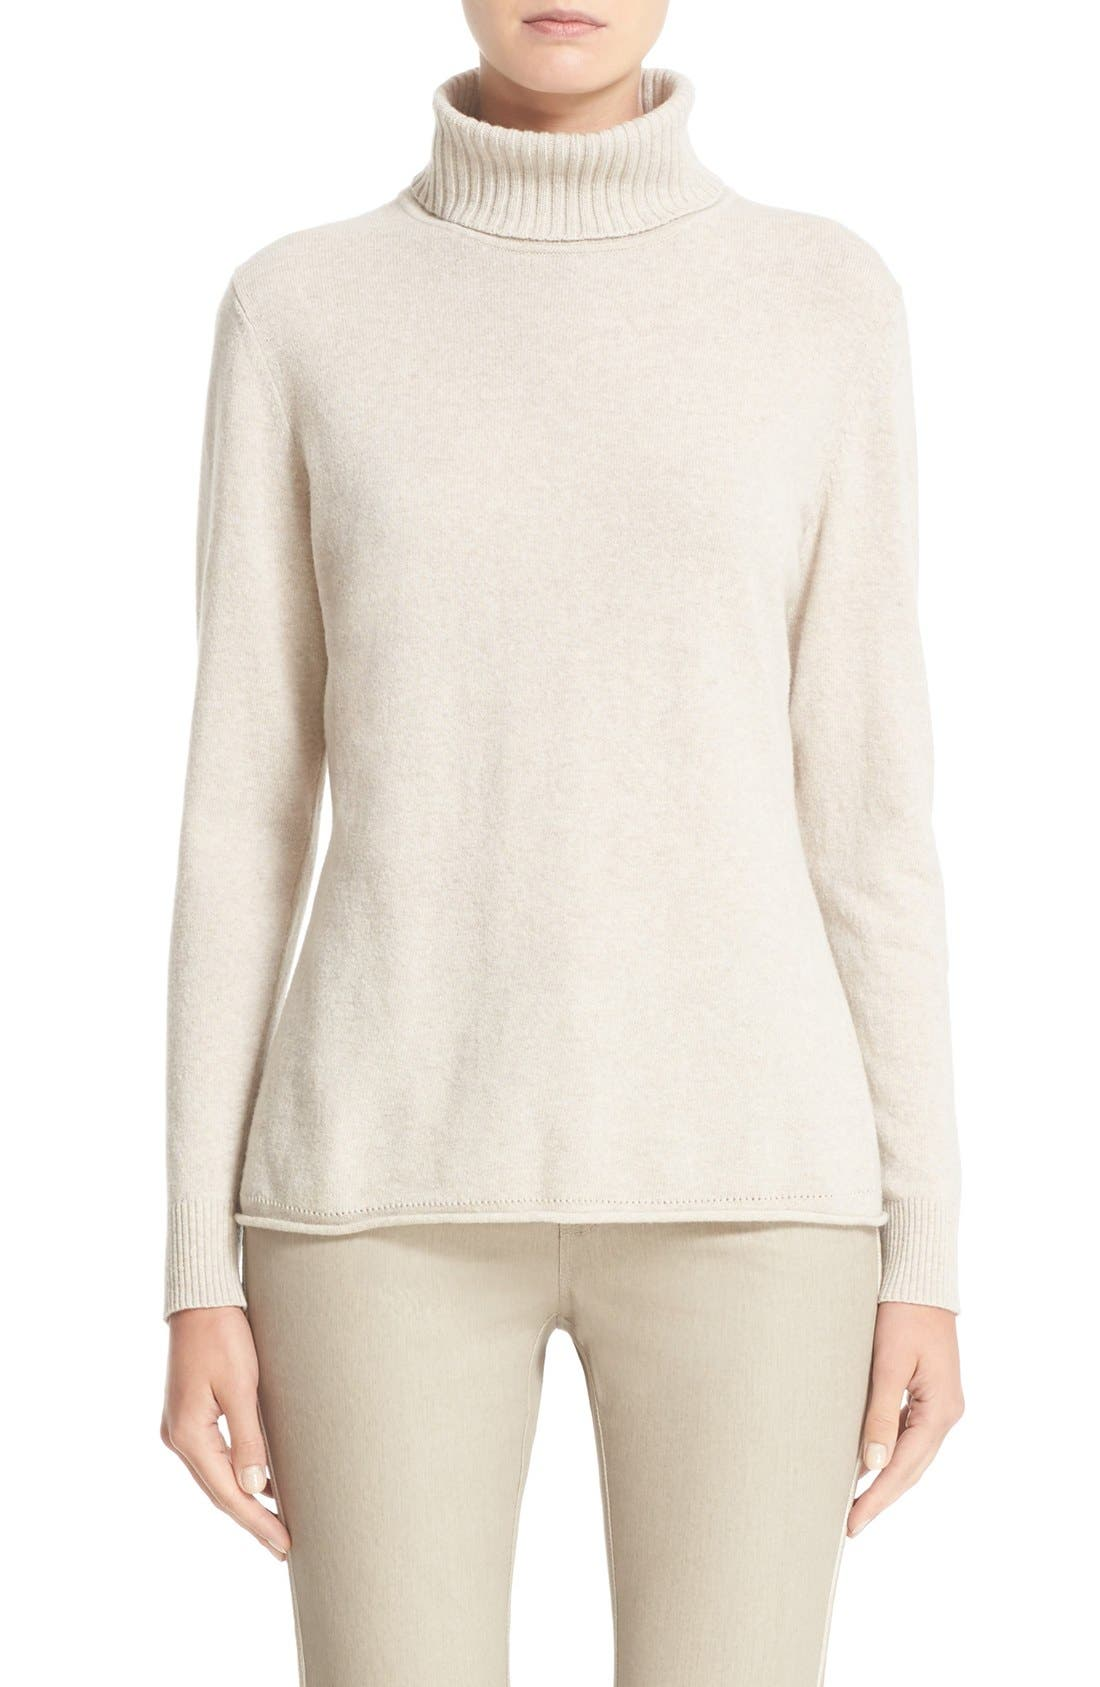 Alternate Image 1 Selected - Lafayette 148 New York Wool & Cashmere Turtleneck Sweater